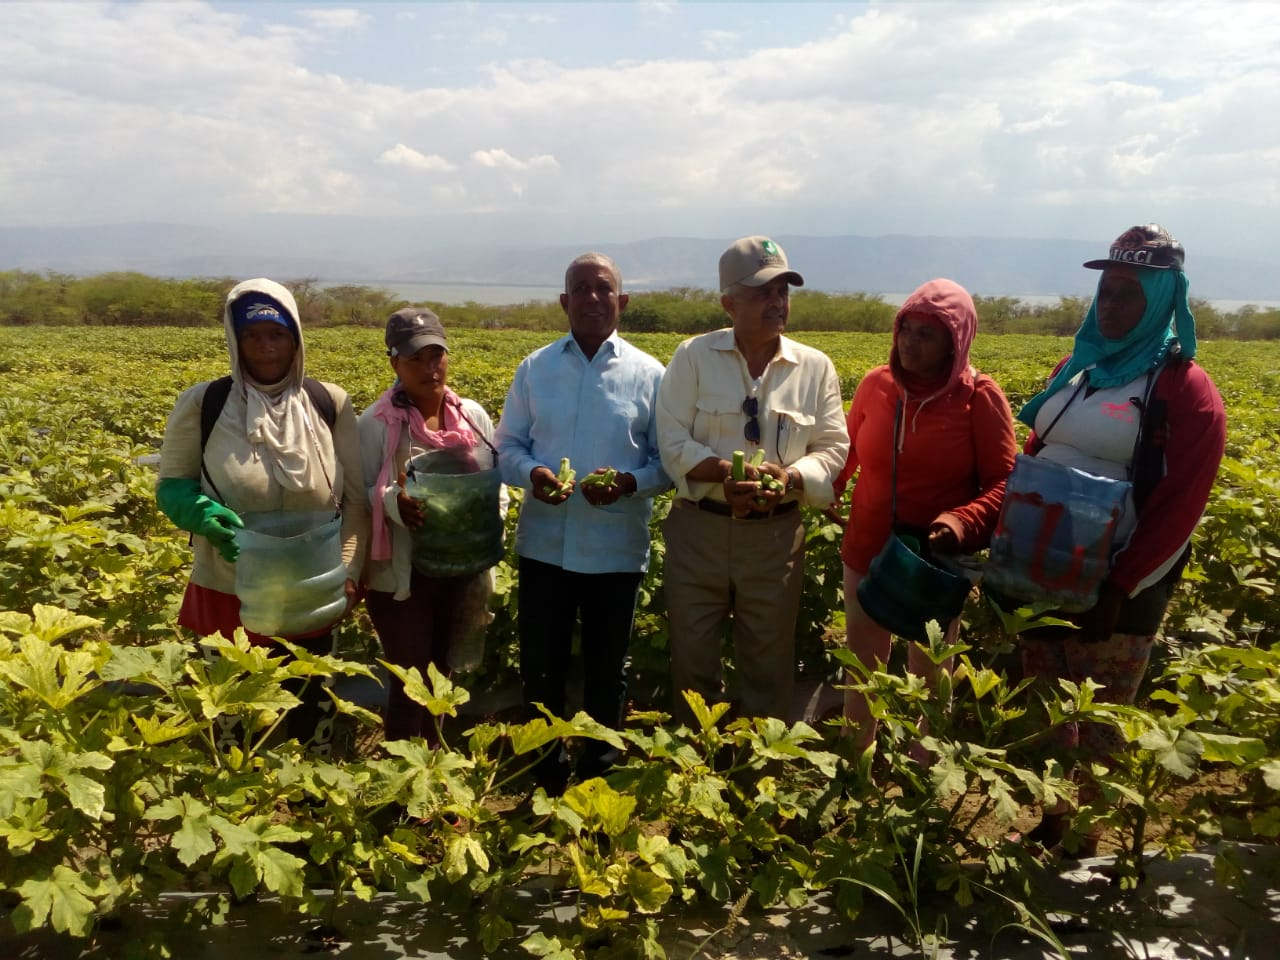 Uva Red Globe en el Valle de Neiba., Ministro de Agricultura Osmar Benítez anuncia el cultivo de Dos Mil tareas de Uva Red Globe en el Valle de Neiba.